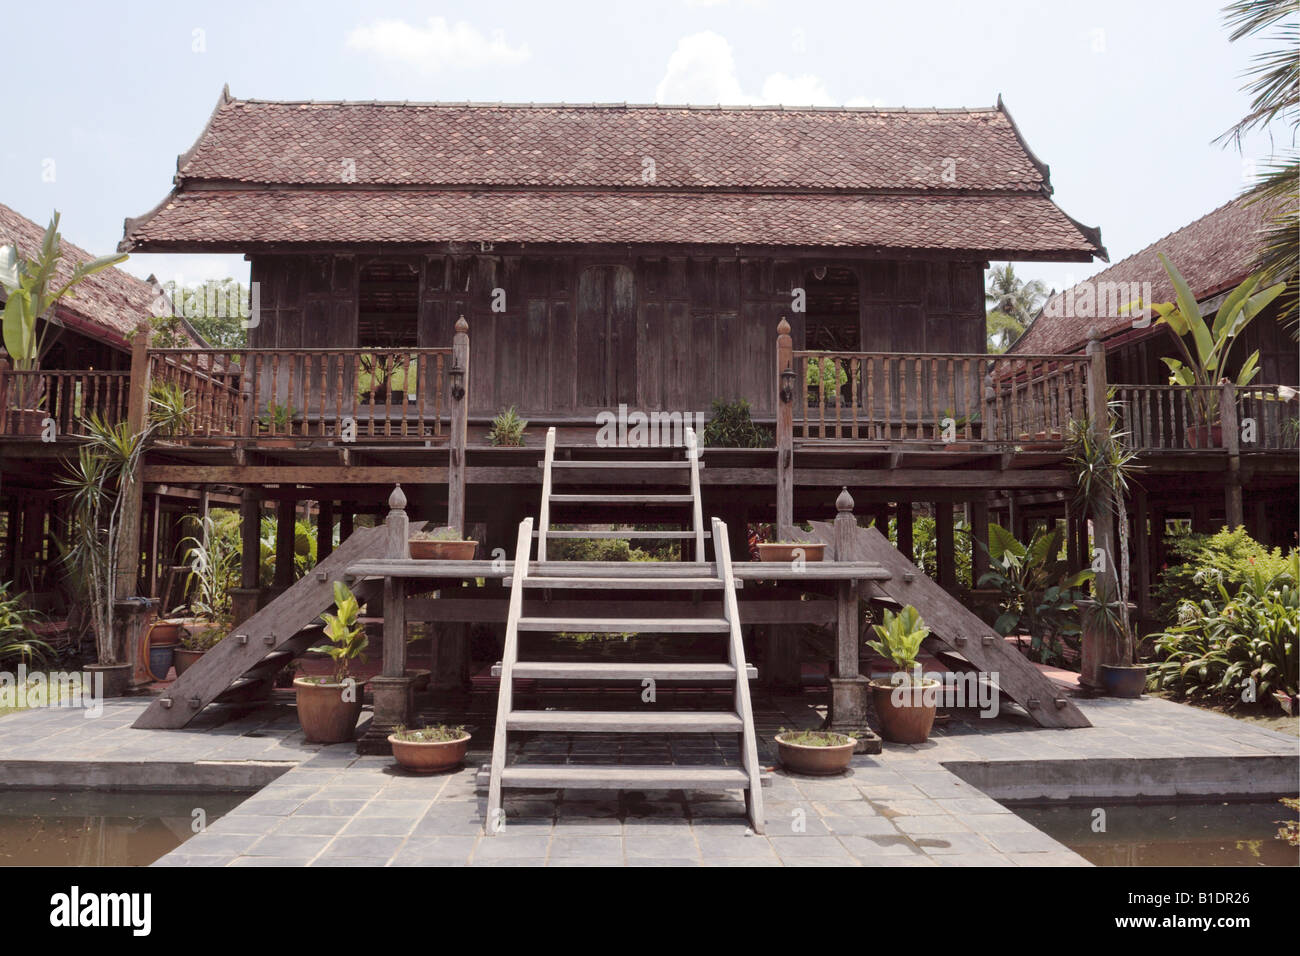 Traditional Timber Malay House At Pura Tanjung Sabtu In